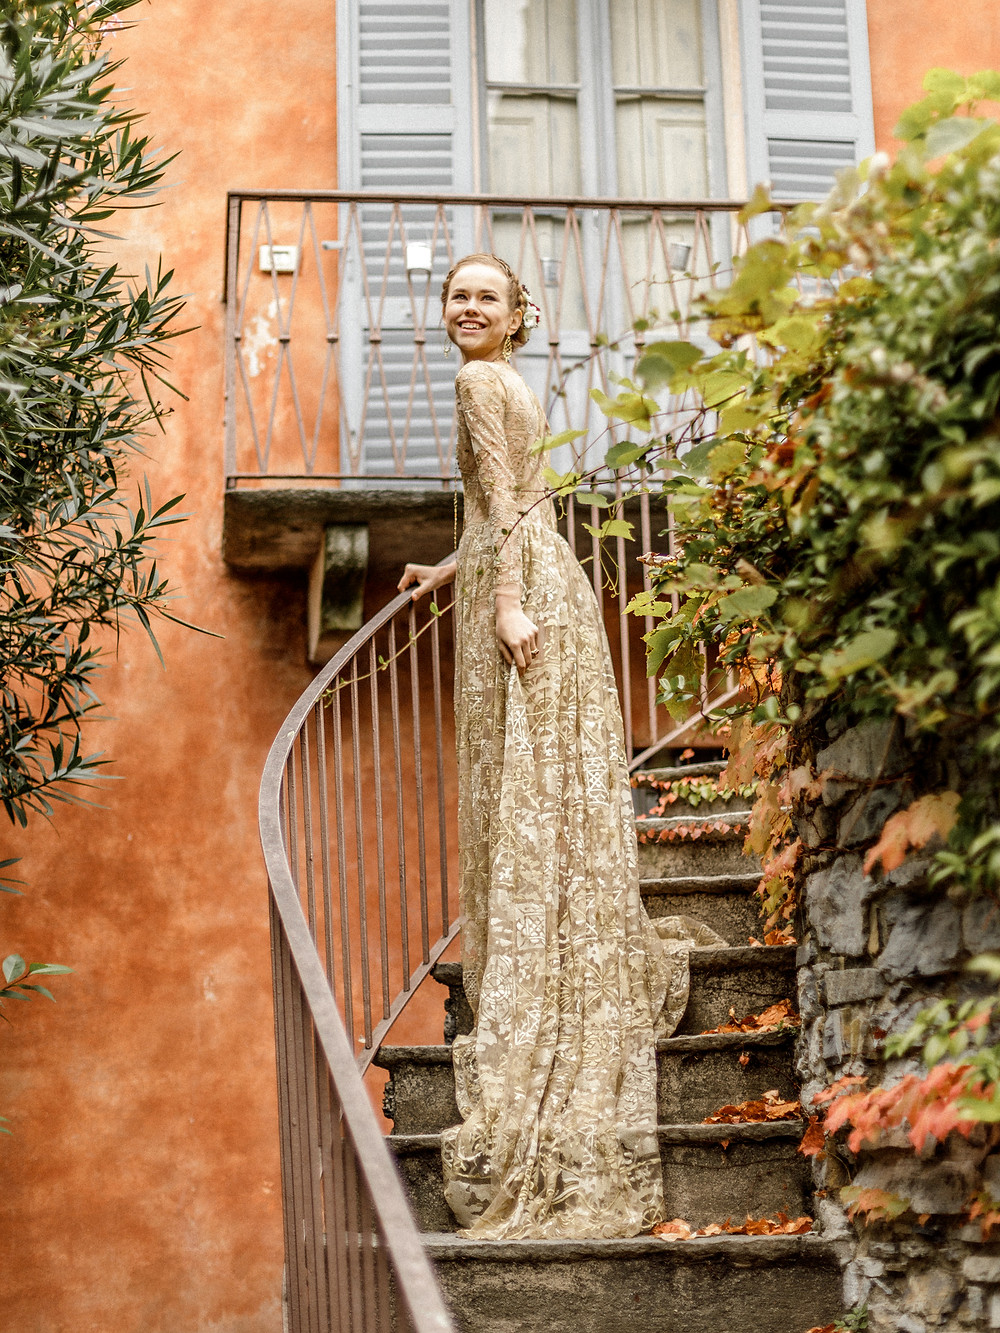 Braut in historischer Villa am Comosee